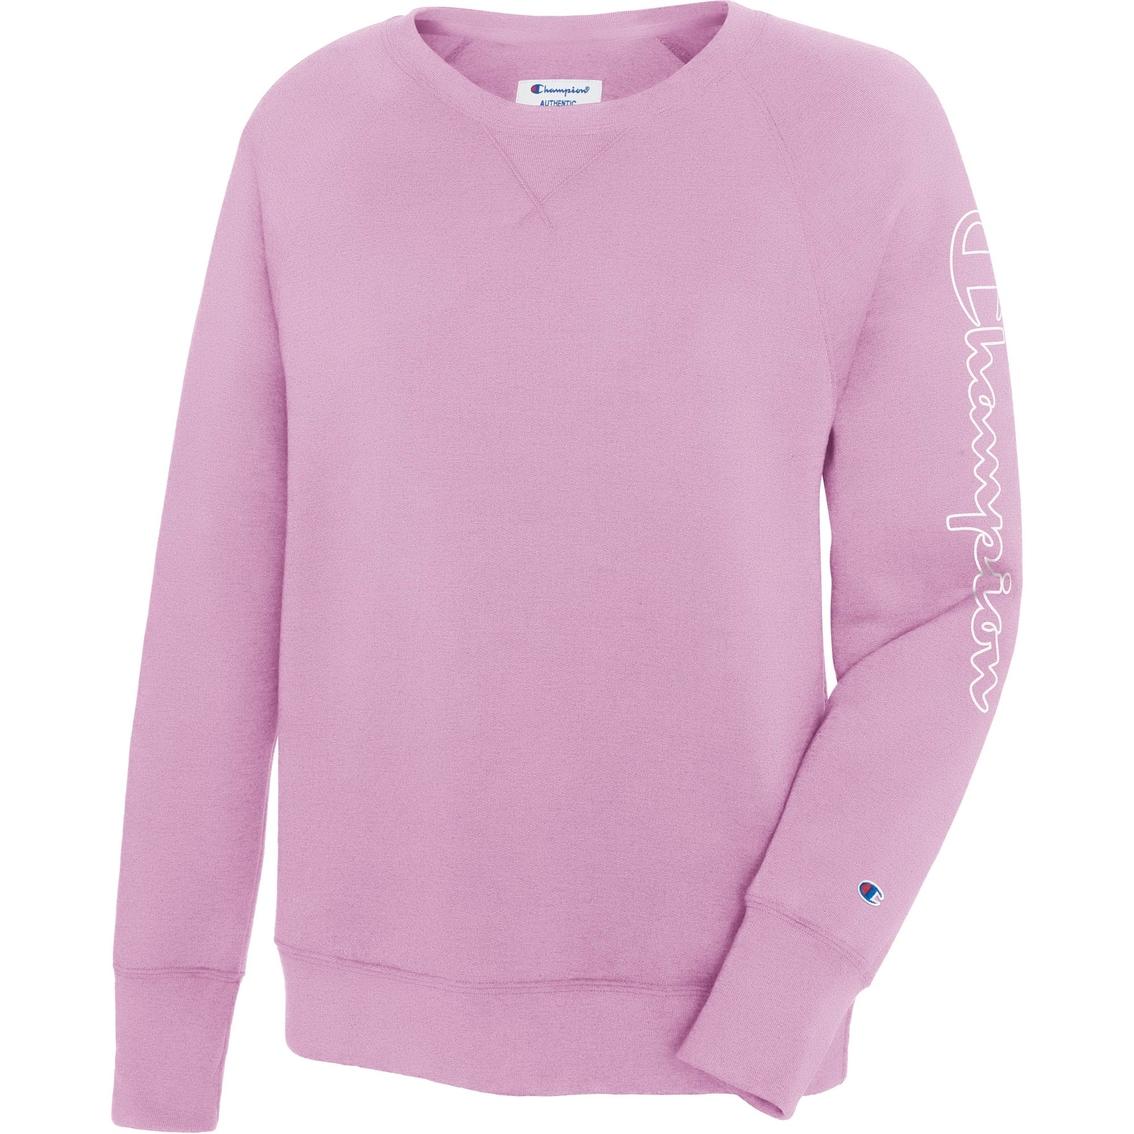 0aa9ec3fcc1d Champion Fleece Boyfriend Crew Sweatshirt | Hoodies & Sweatshirts ...